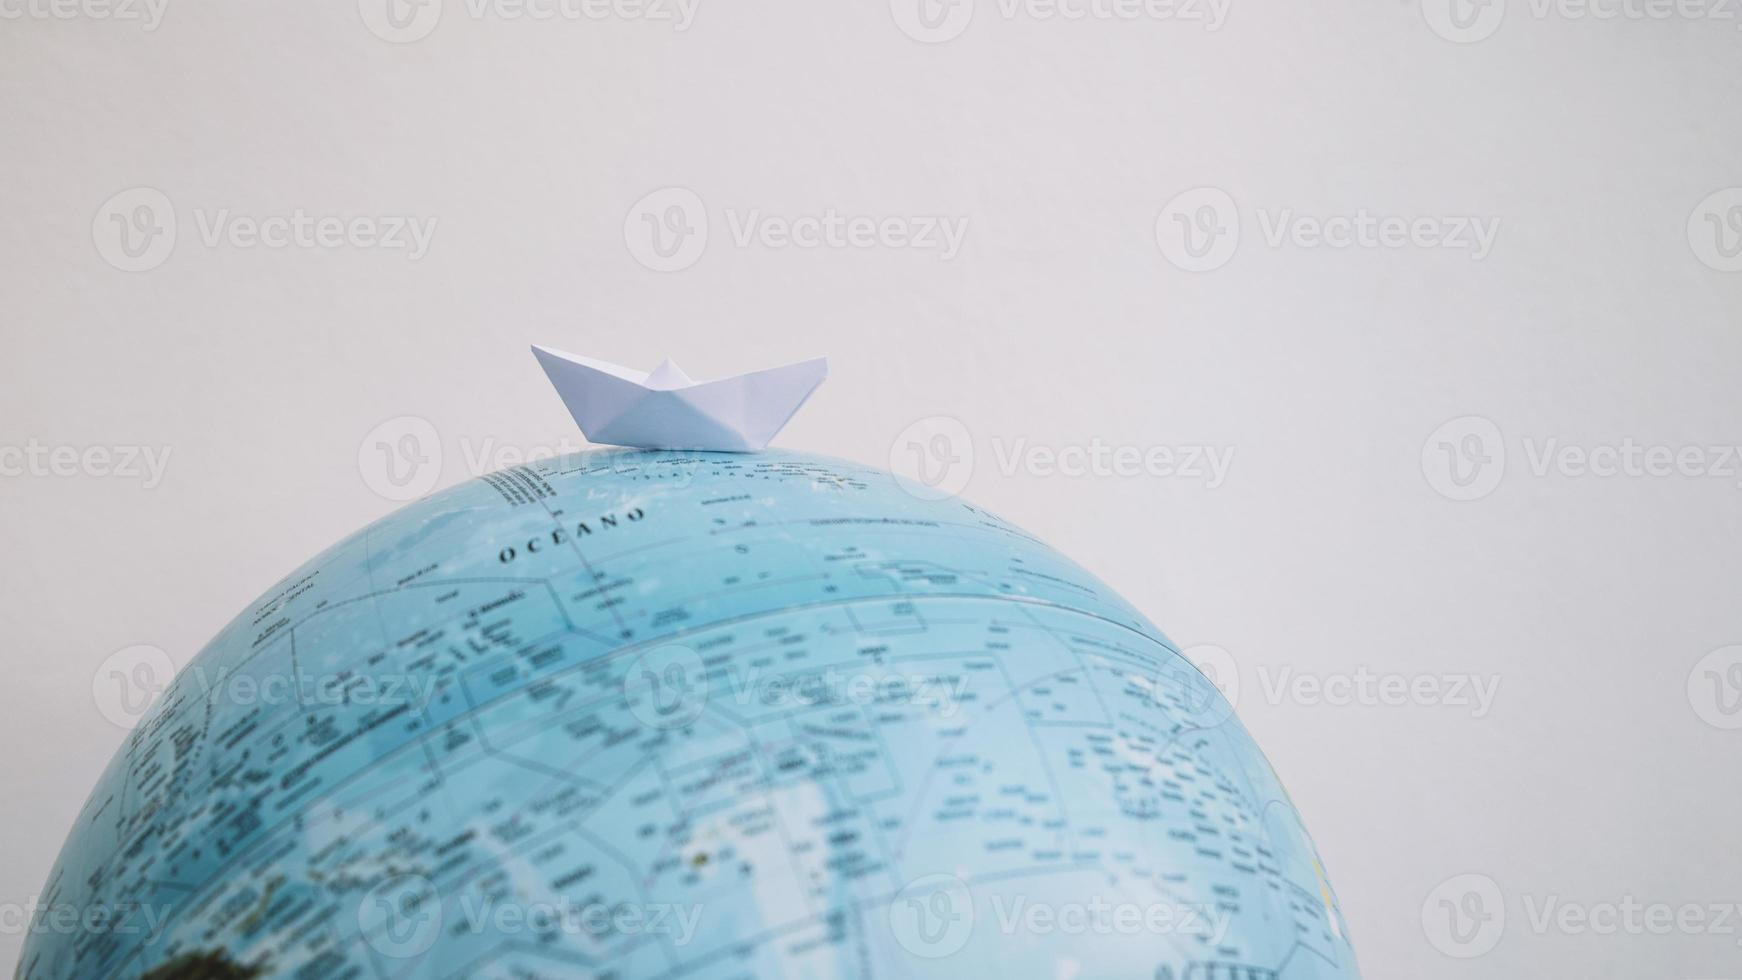 barco de papel en un globo foto